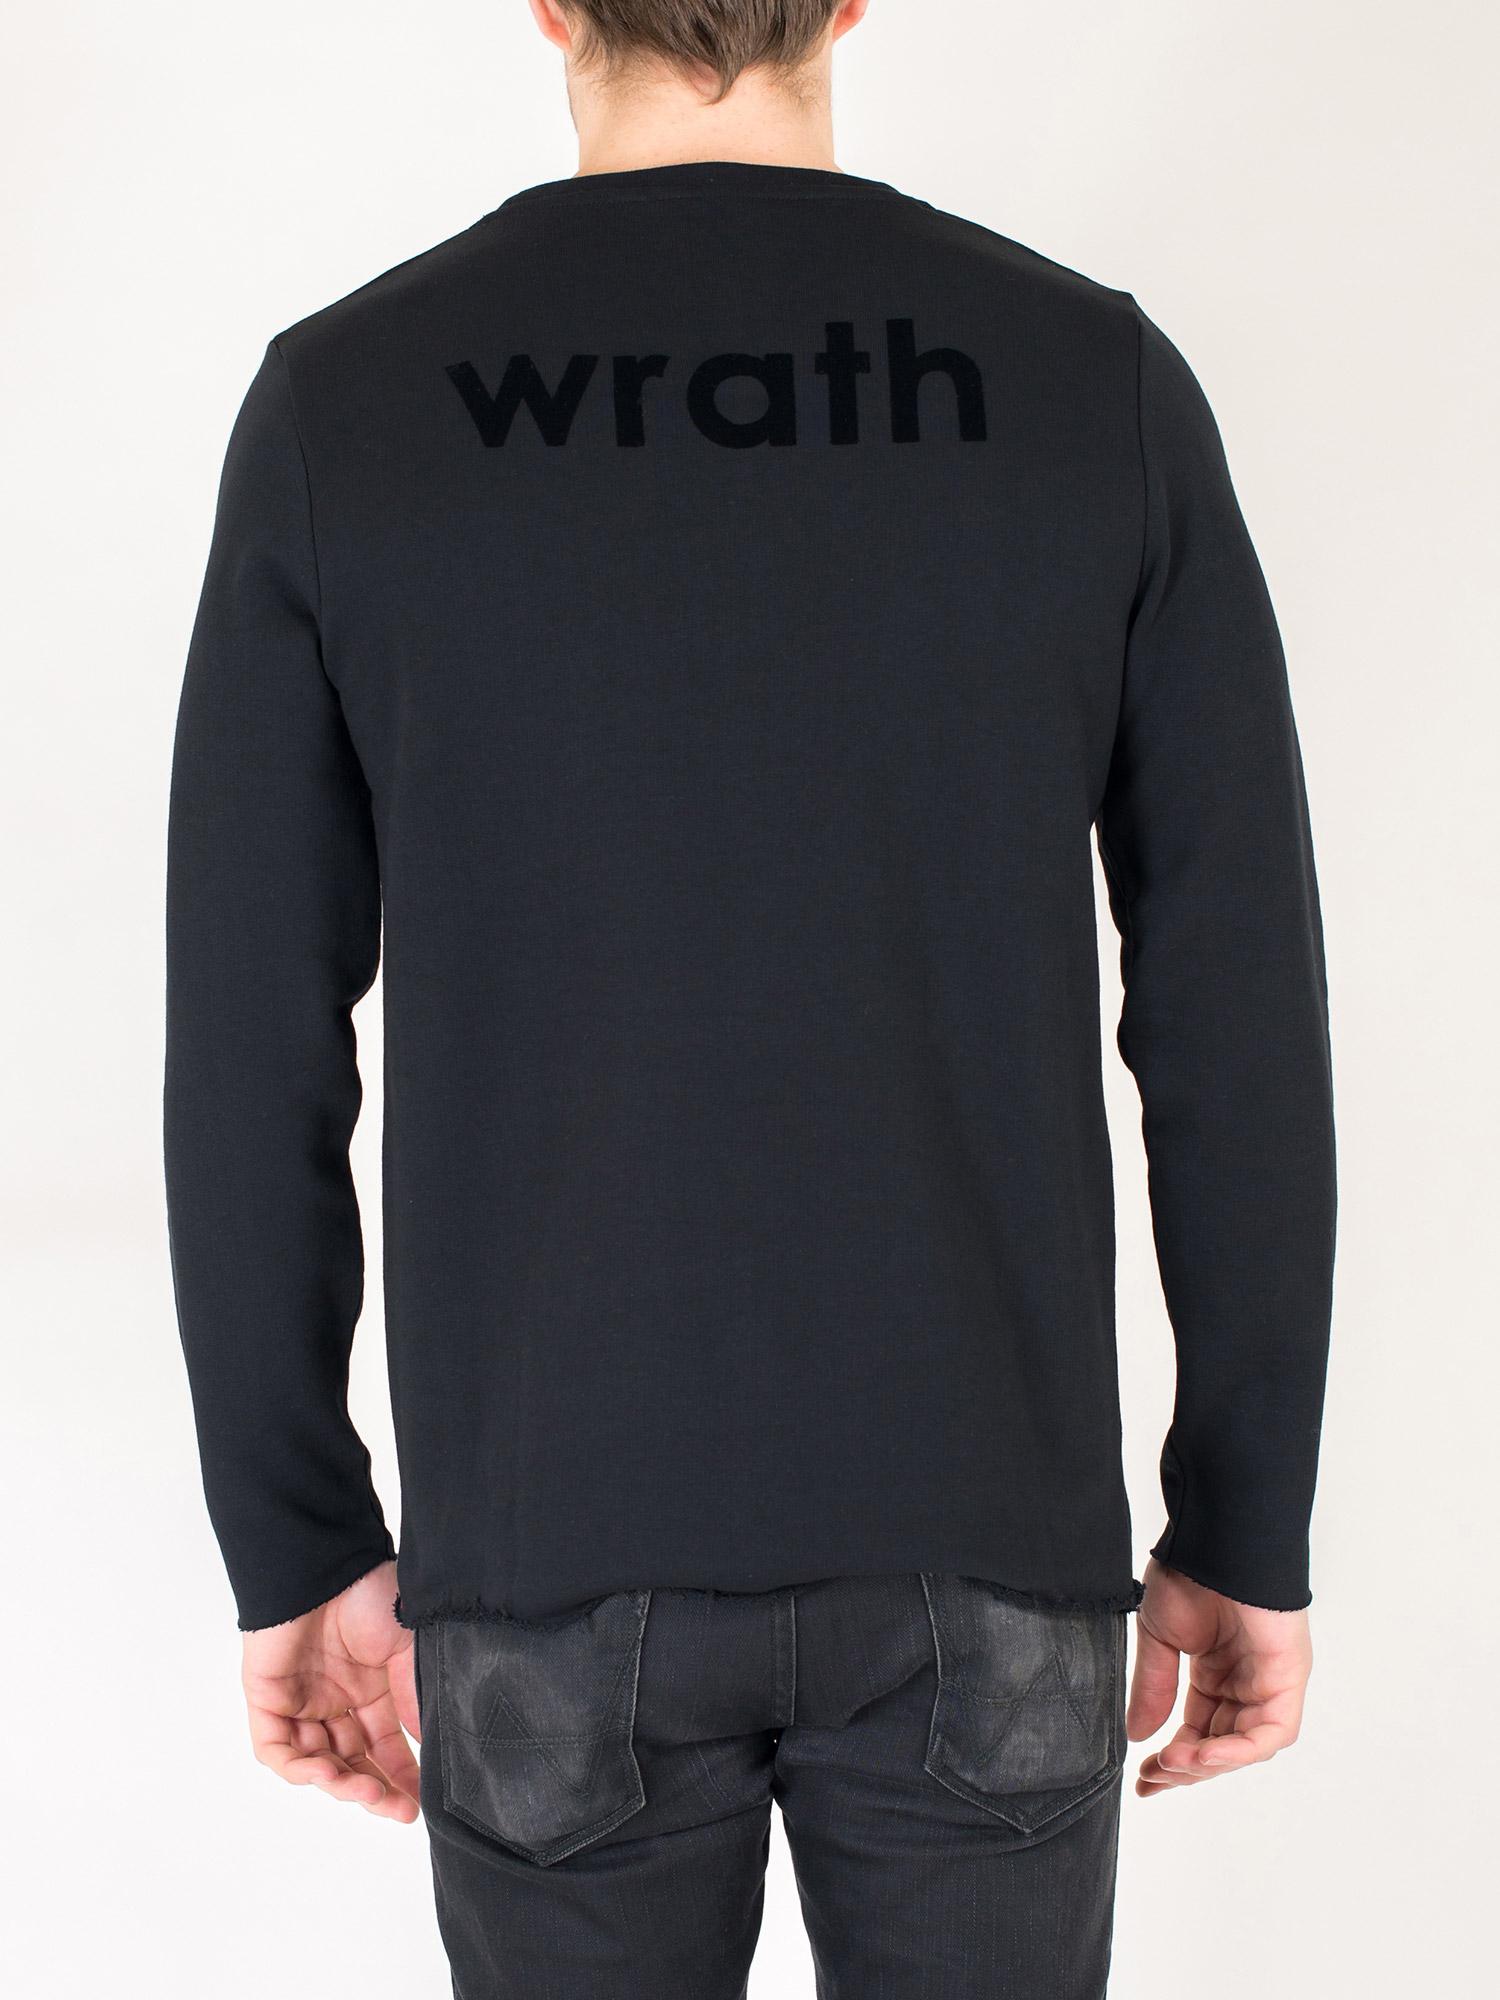 Levi-wrath